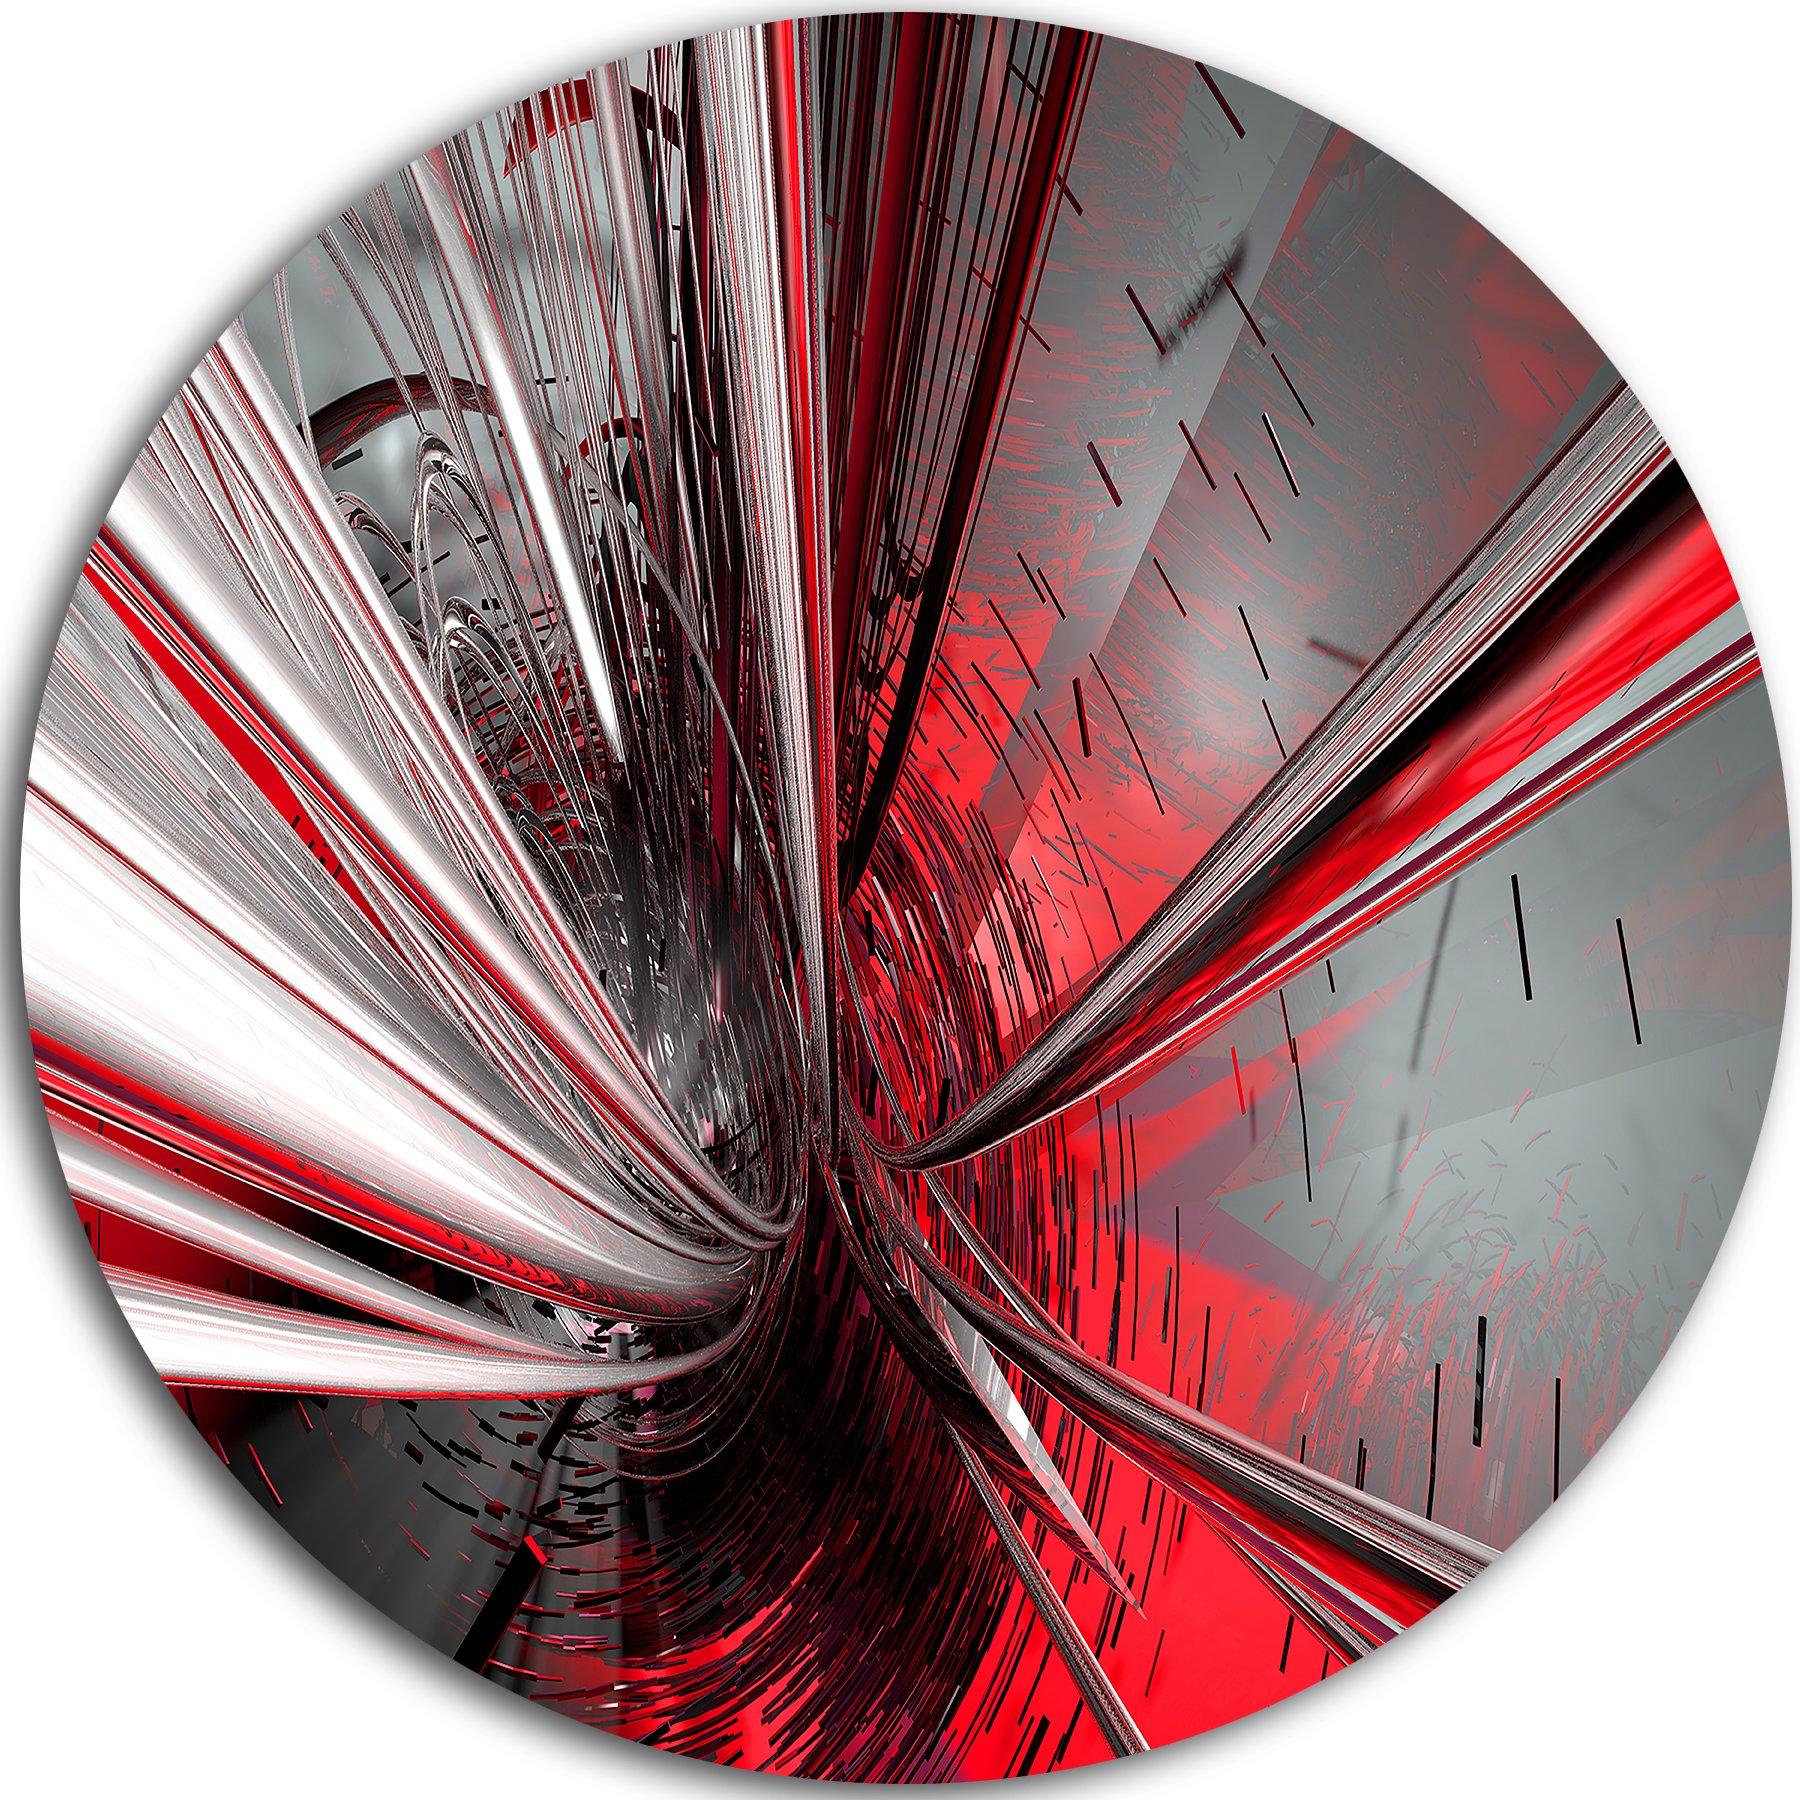 Designart MT9201-C38 ''Fractal 3D Deep into Middle Abstract Art Disc'' Metal Wall Art, 38'' x 38'', Red by Design Art